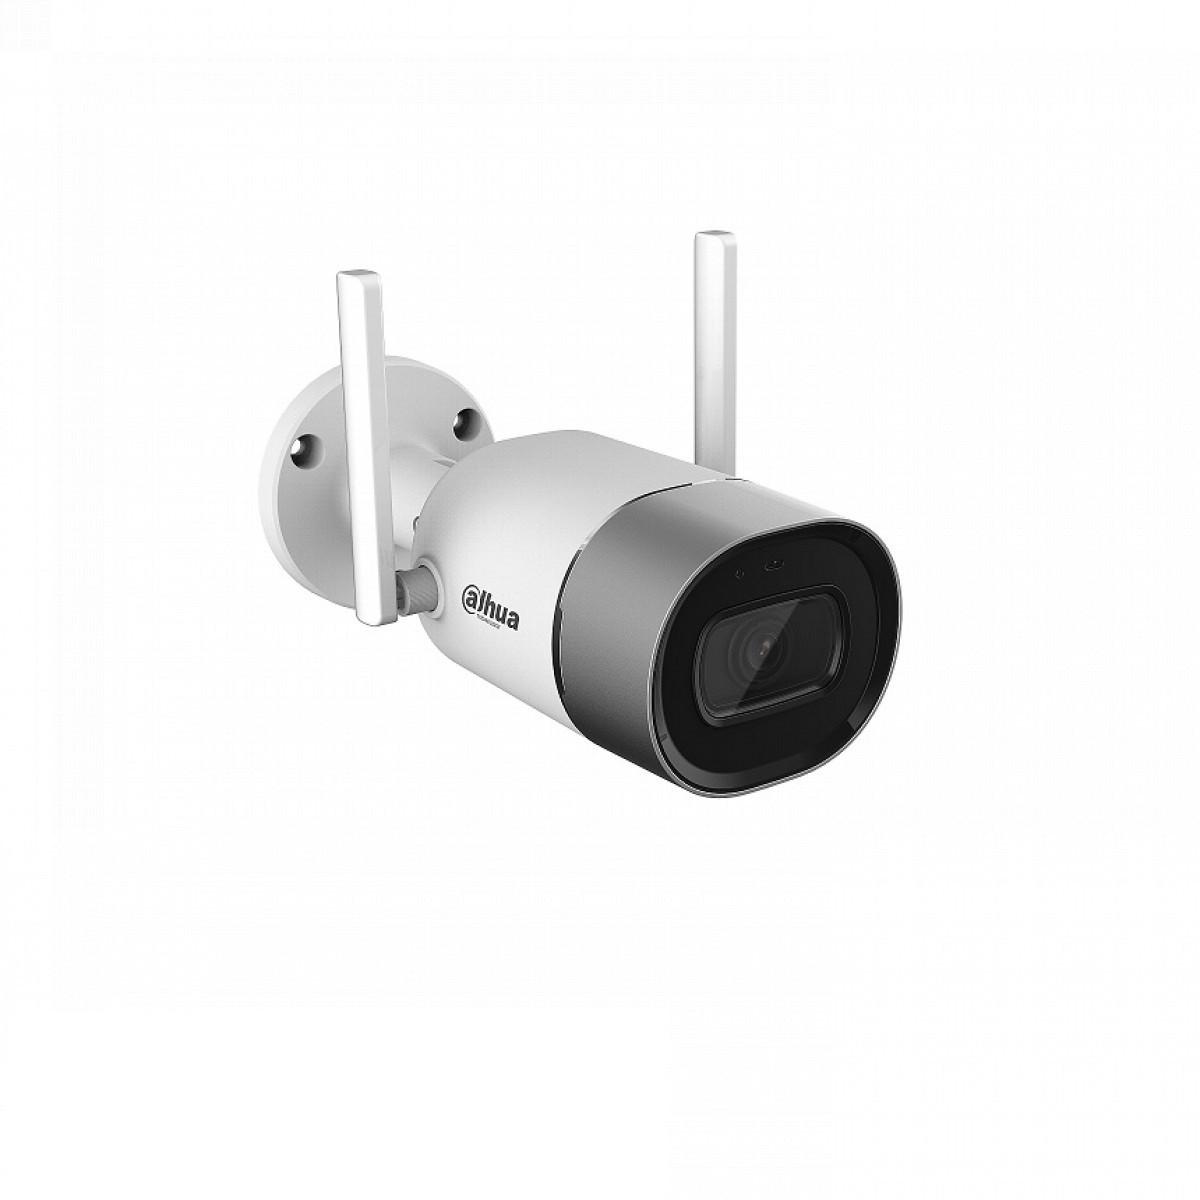 Видеокамера Dahua DH-IPC-G26P